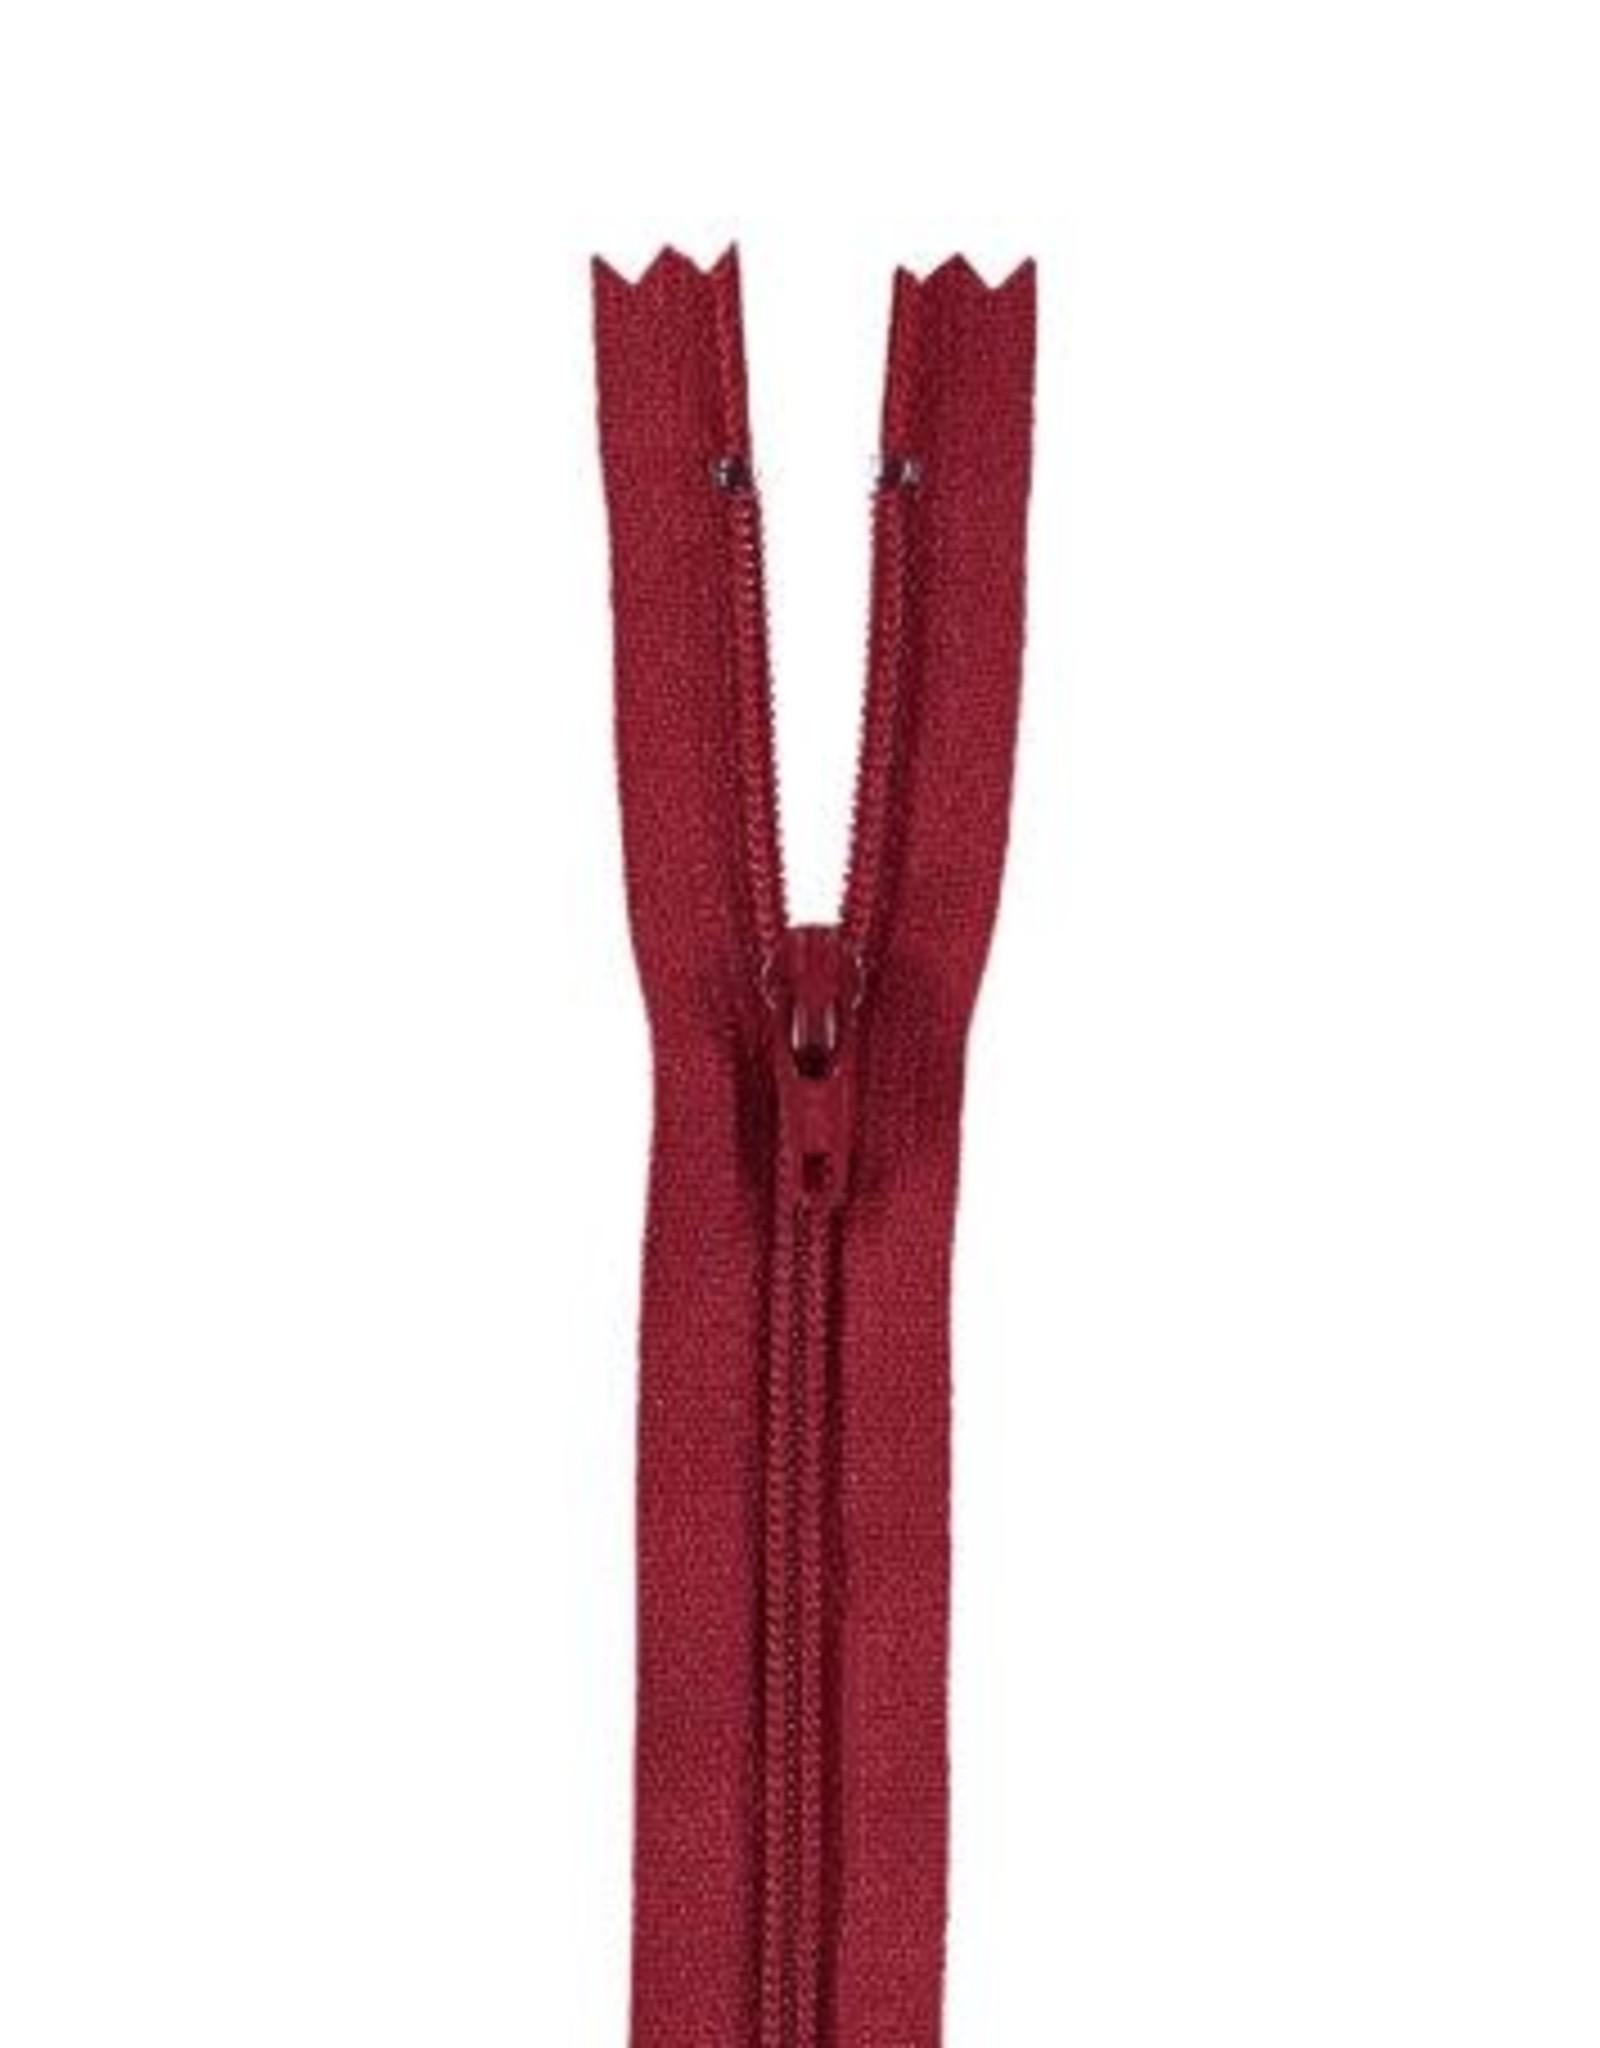 YKK Spiraalrits niet-DB 3mm donker rood 520-25cm